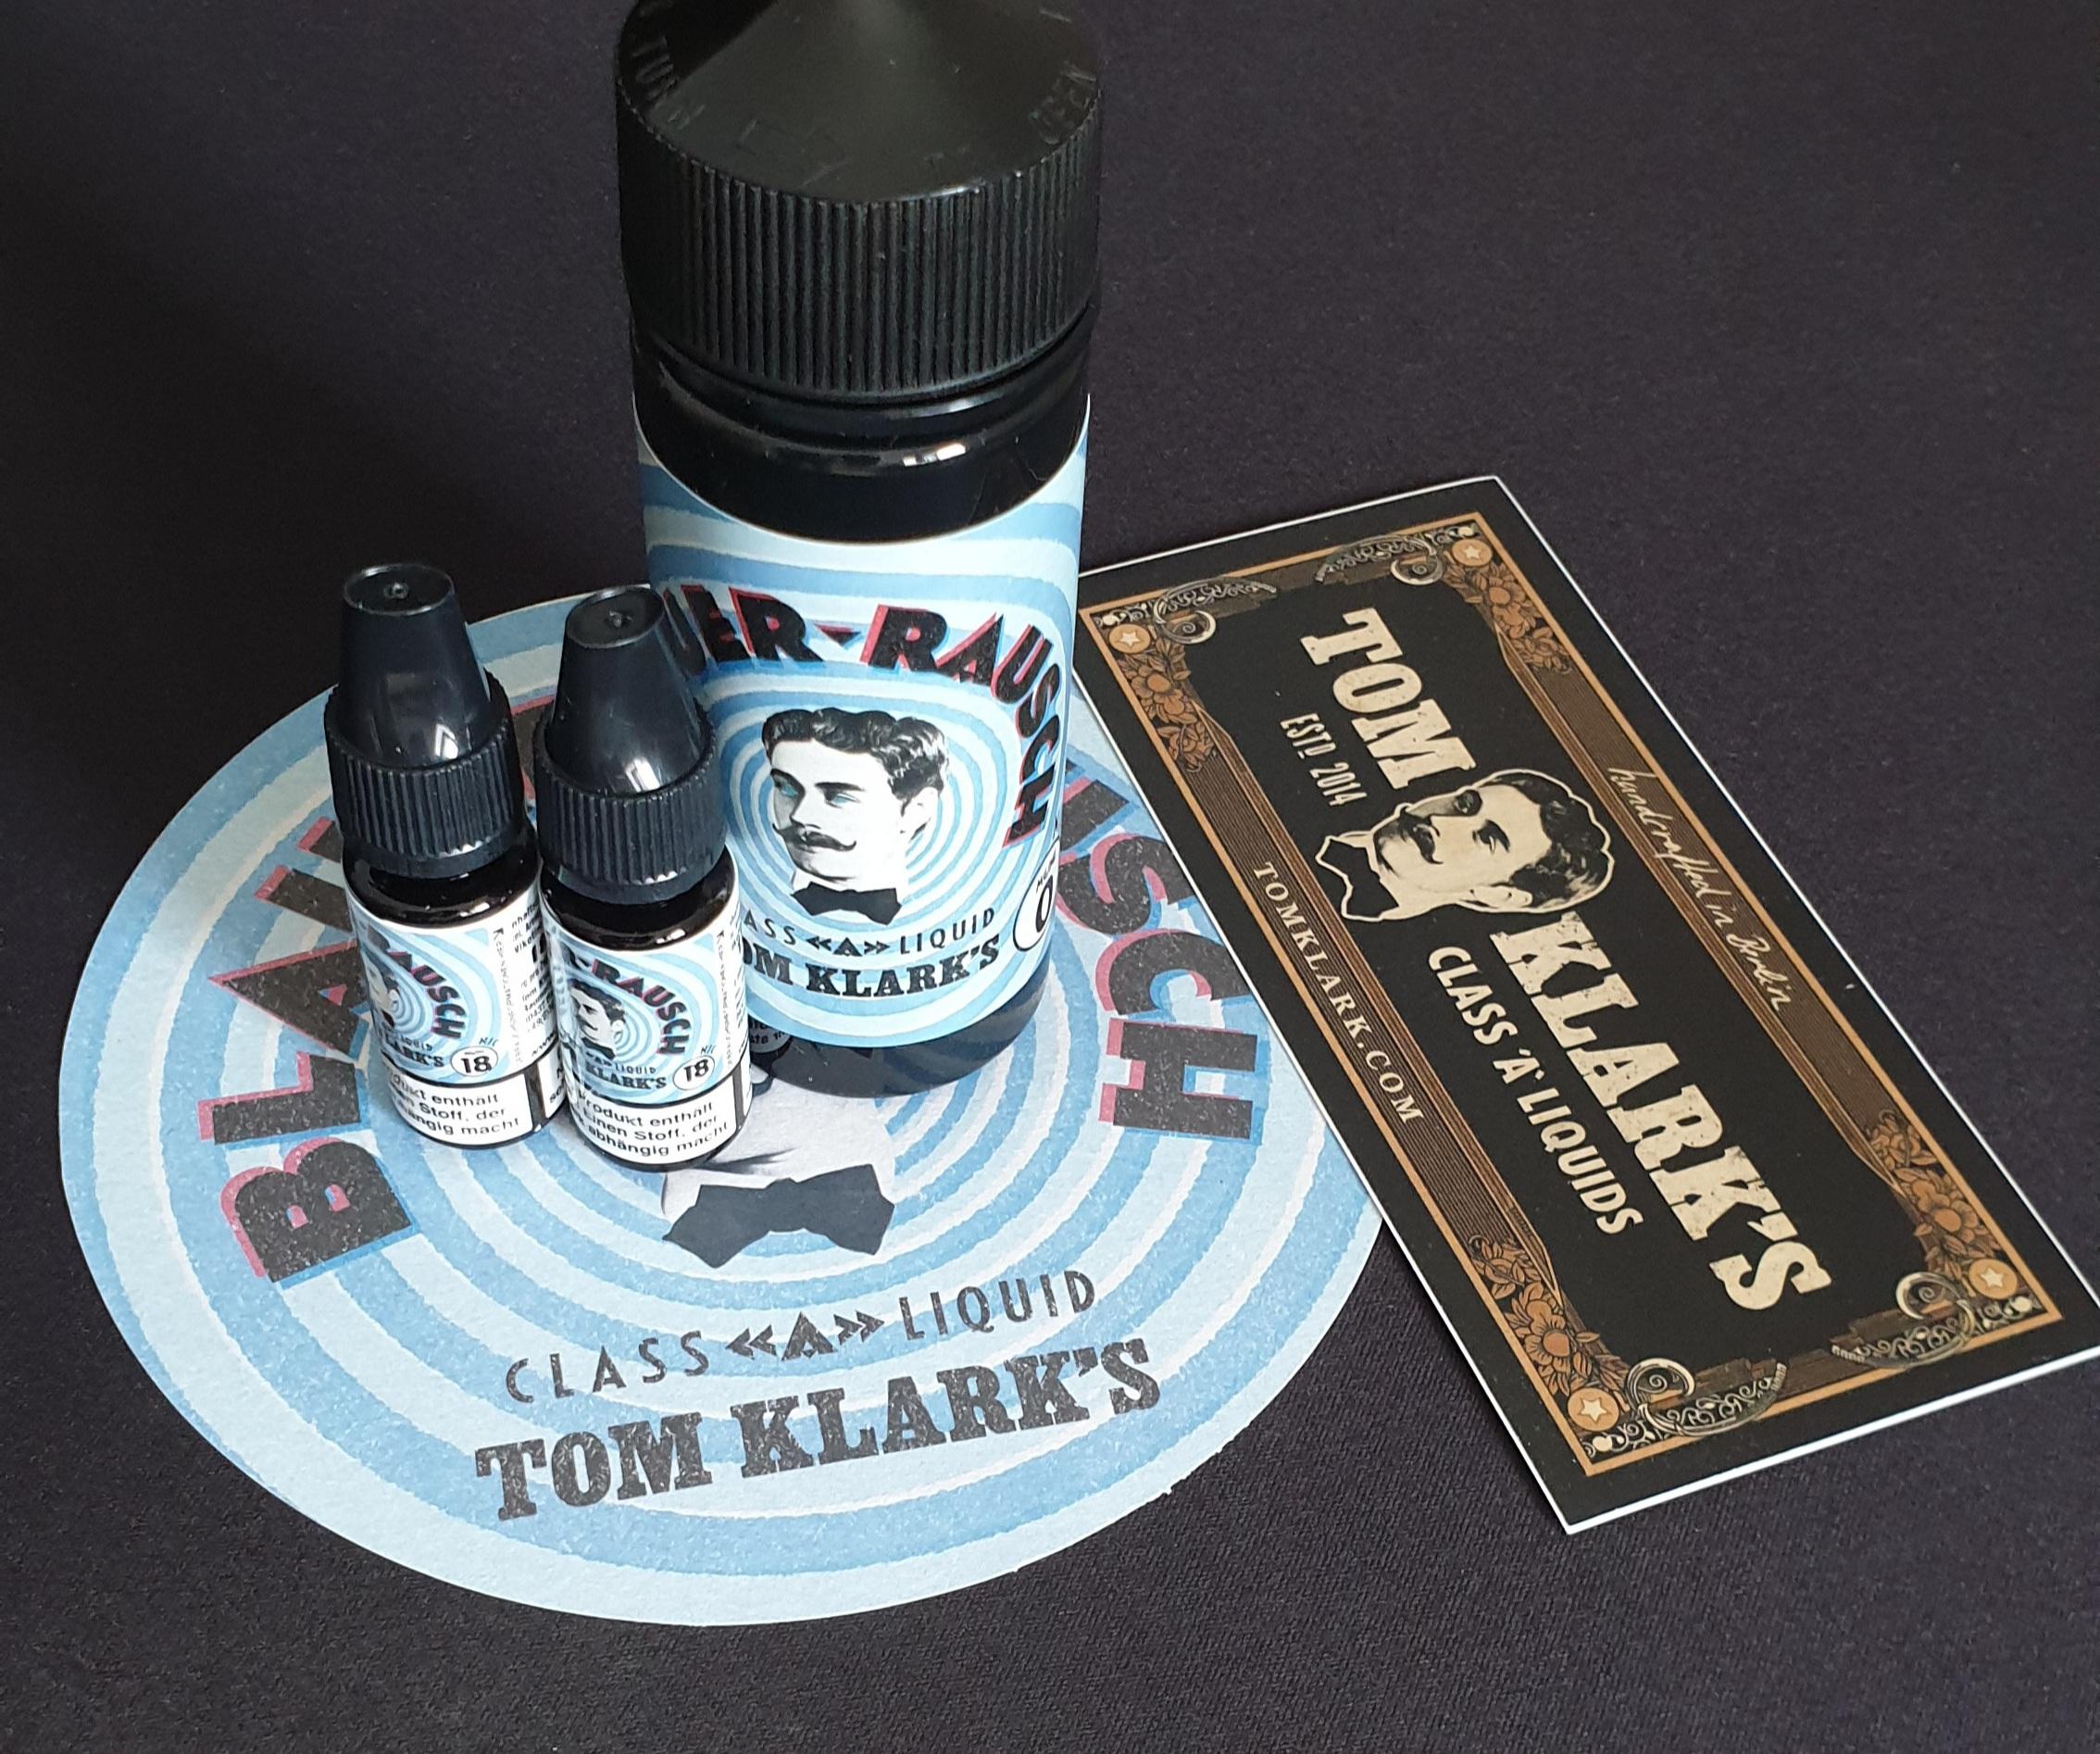 TOM KLARK Blauer Rausch Premium Liquid 120ml 3mg